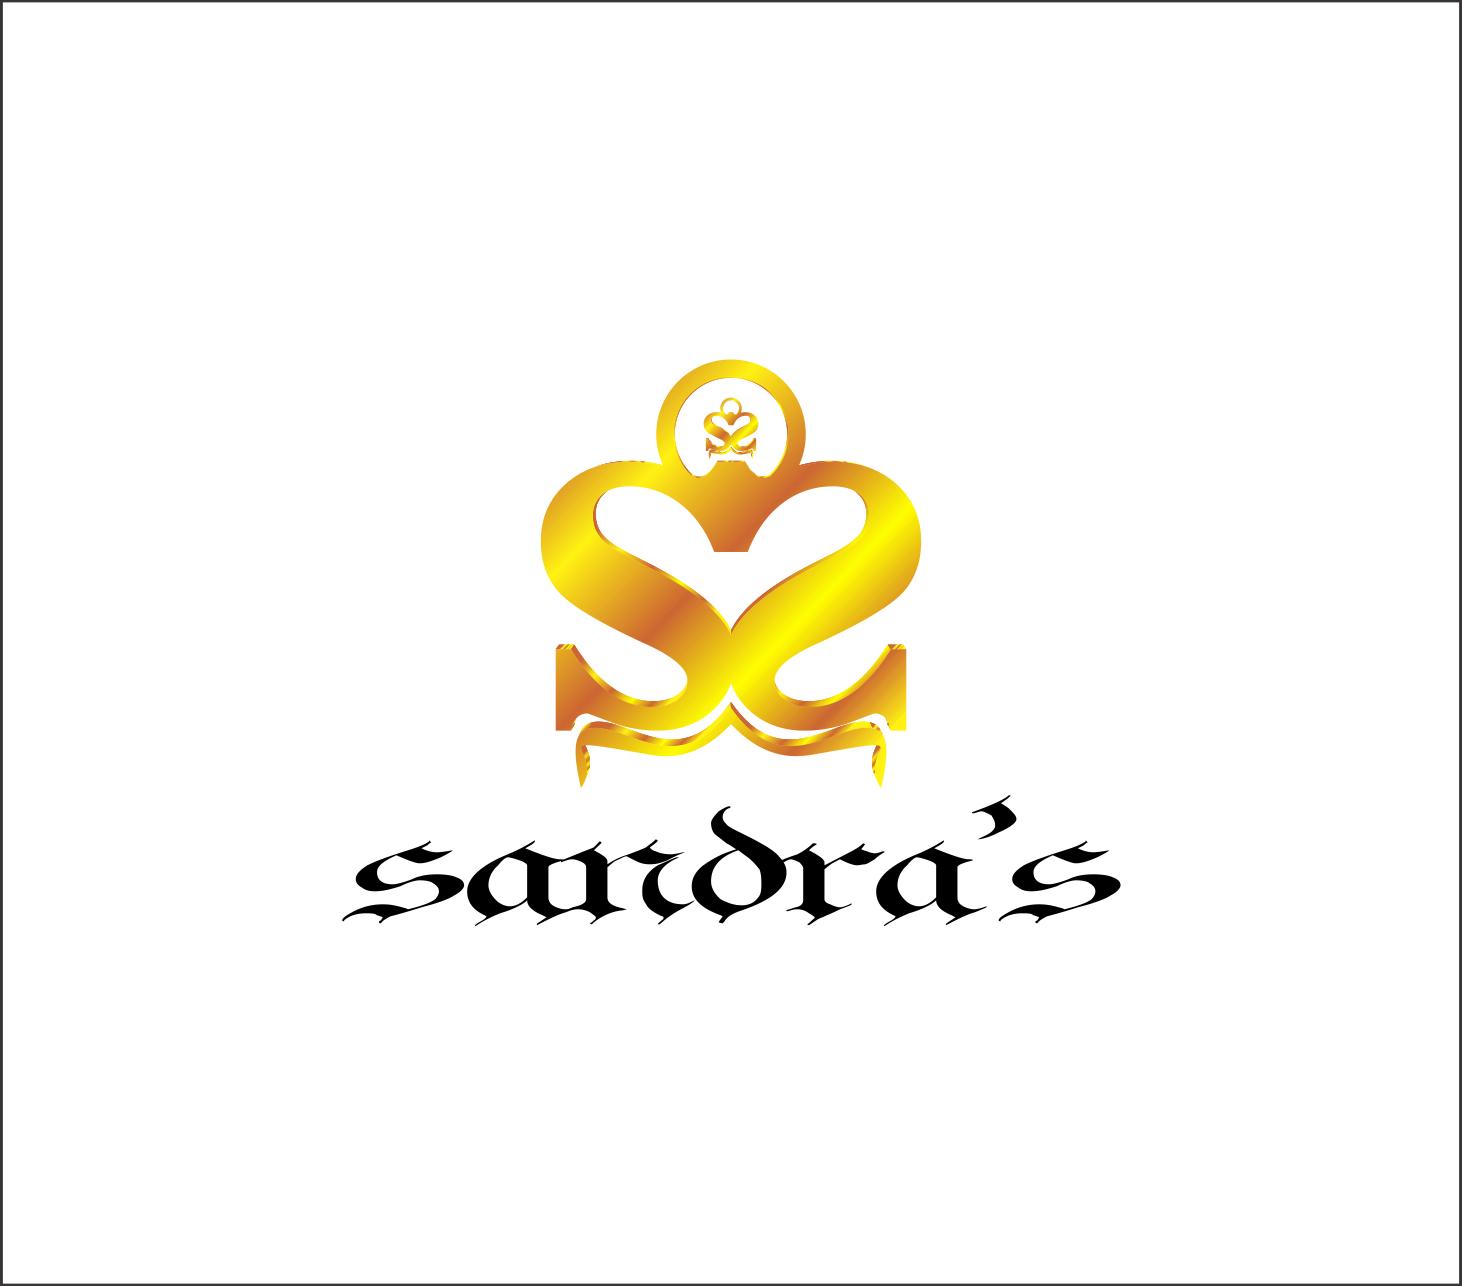 Logo Design by Agus Martoyo - Entry No. 1 in the Logo Design Contest Imaginative Logo Design for Sandra's.